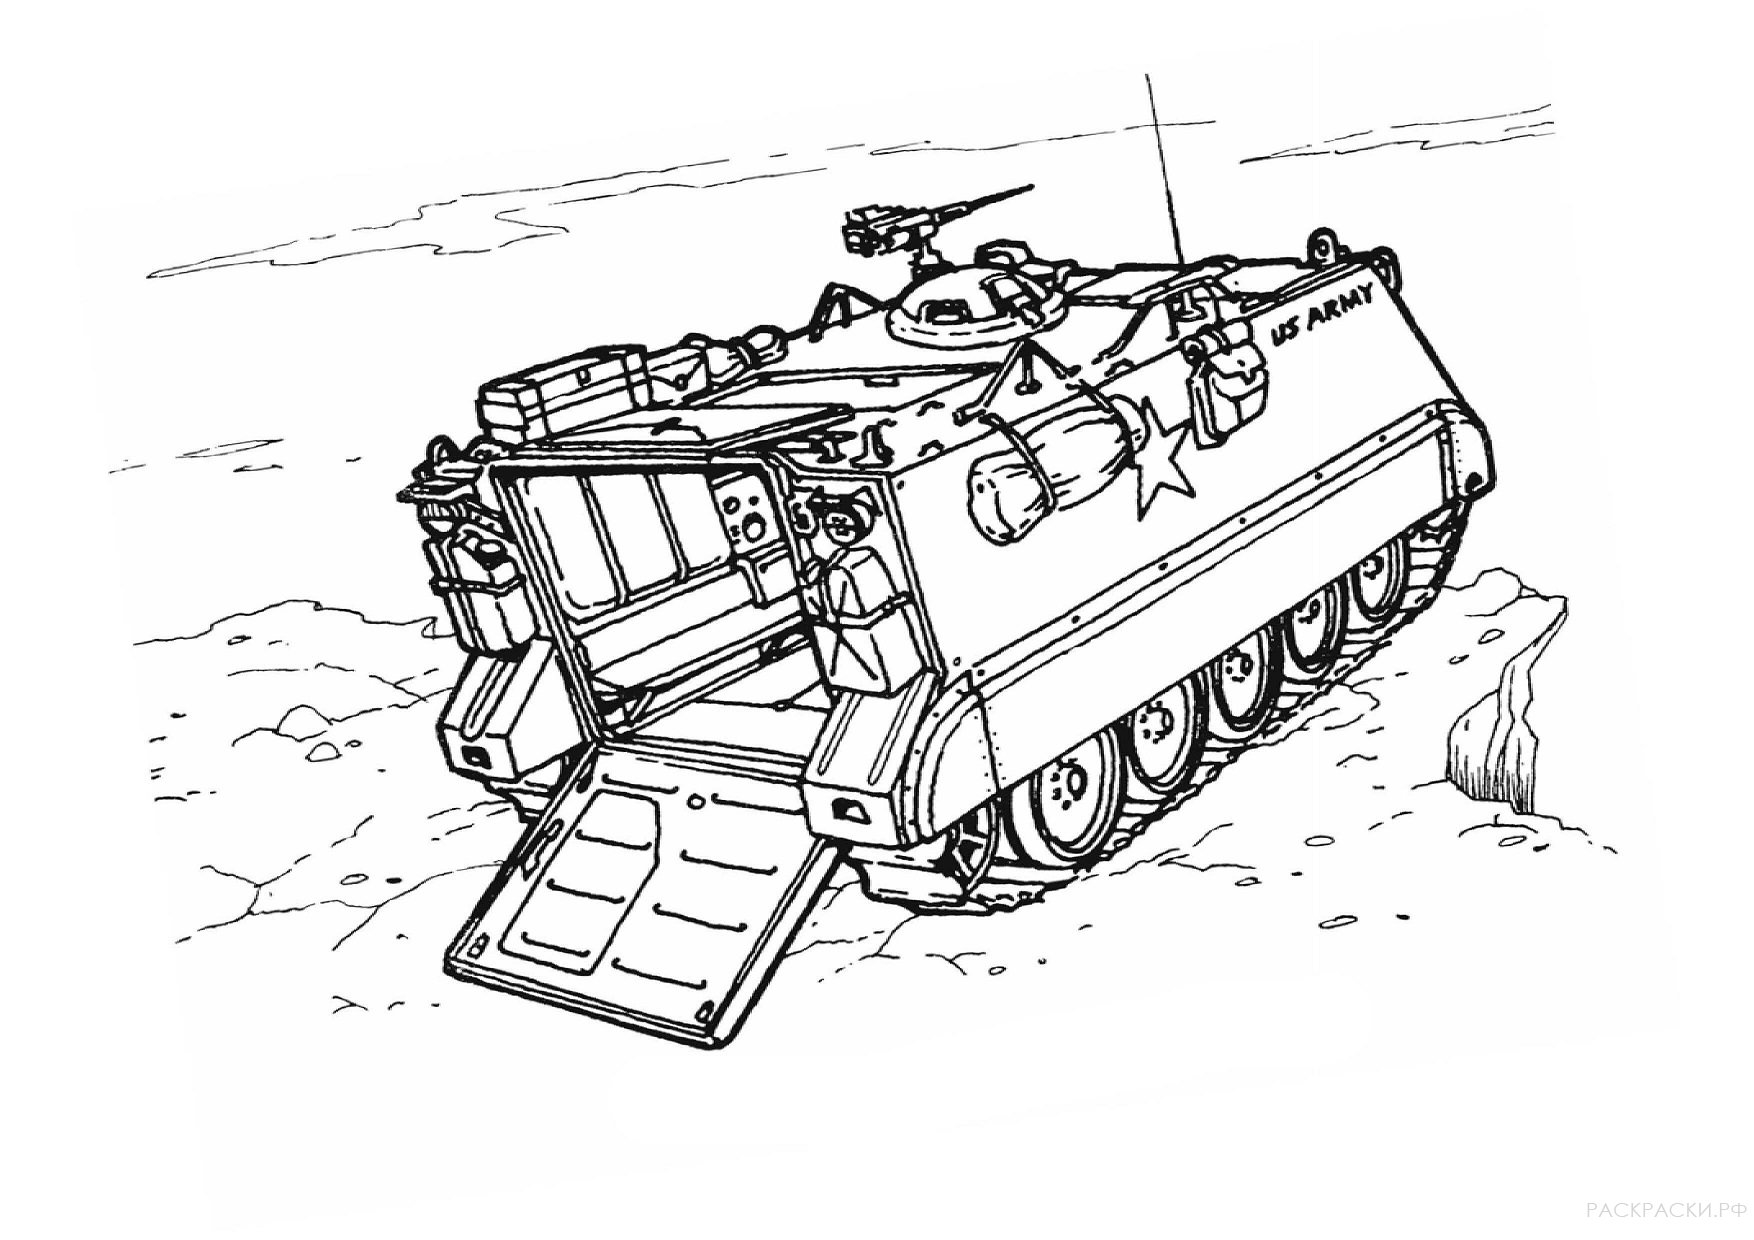 Военная Раскраска Бронетранспортёр M 113